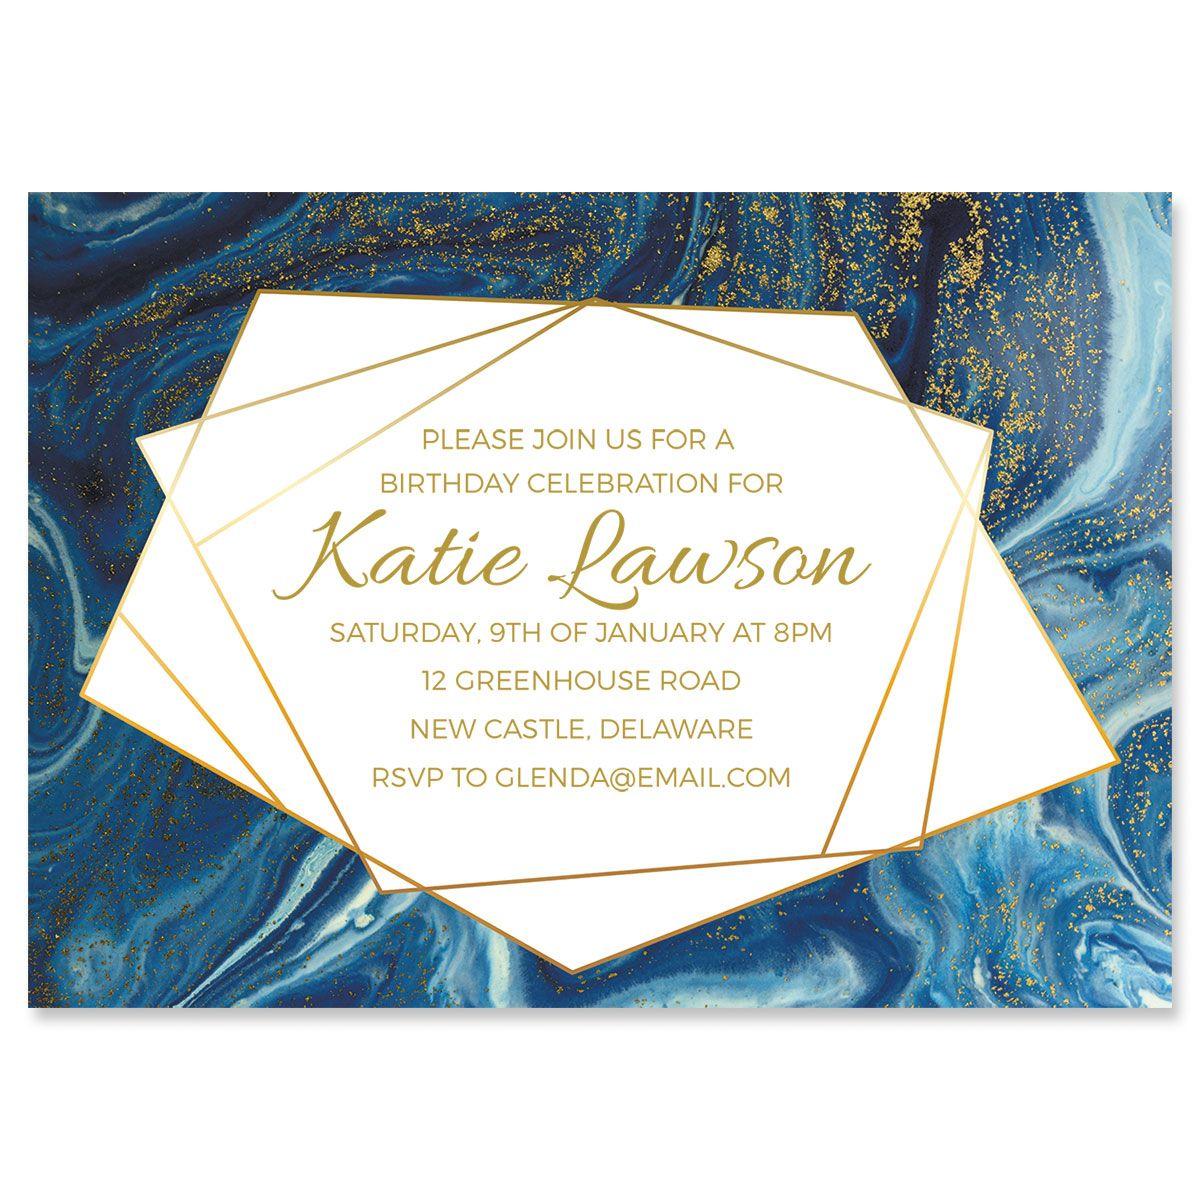 Personalized Modern Marble Indulgence Invitation